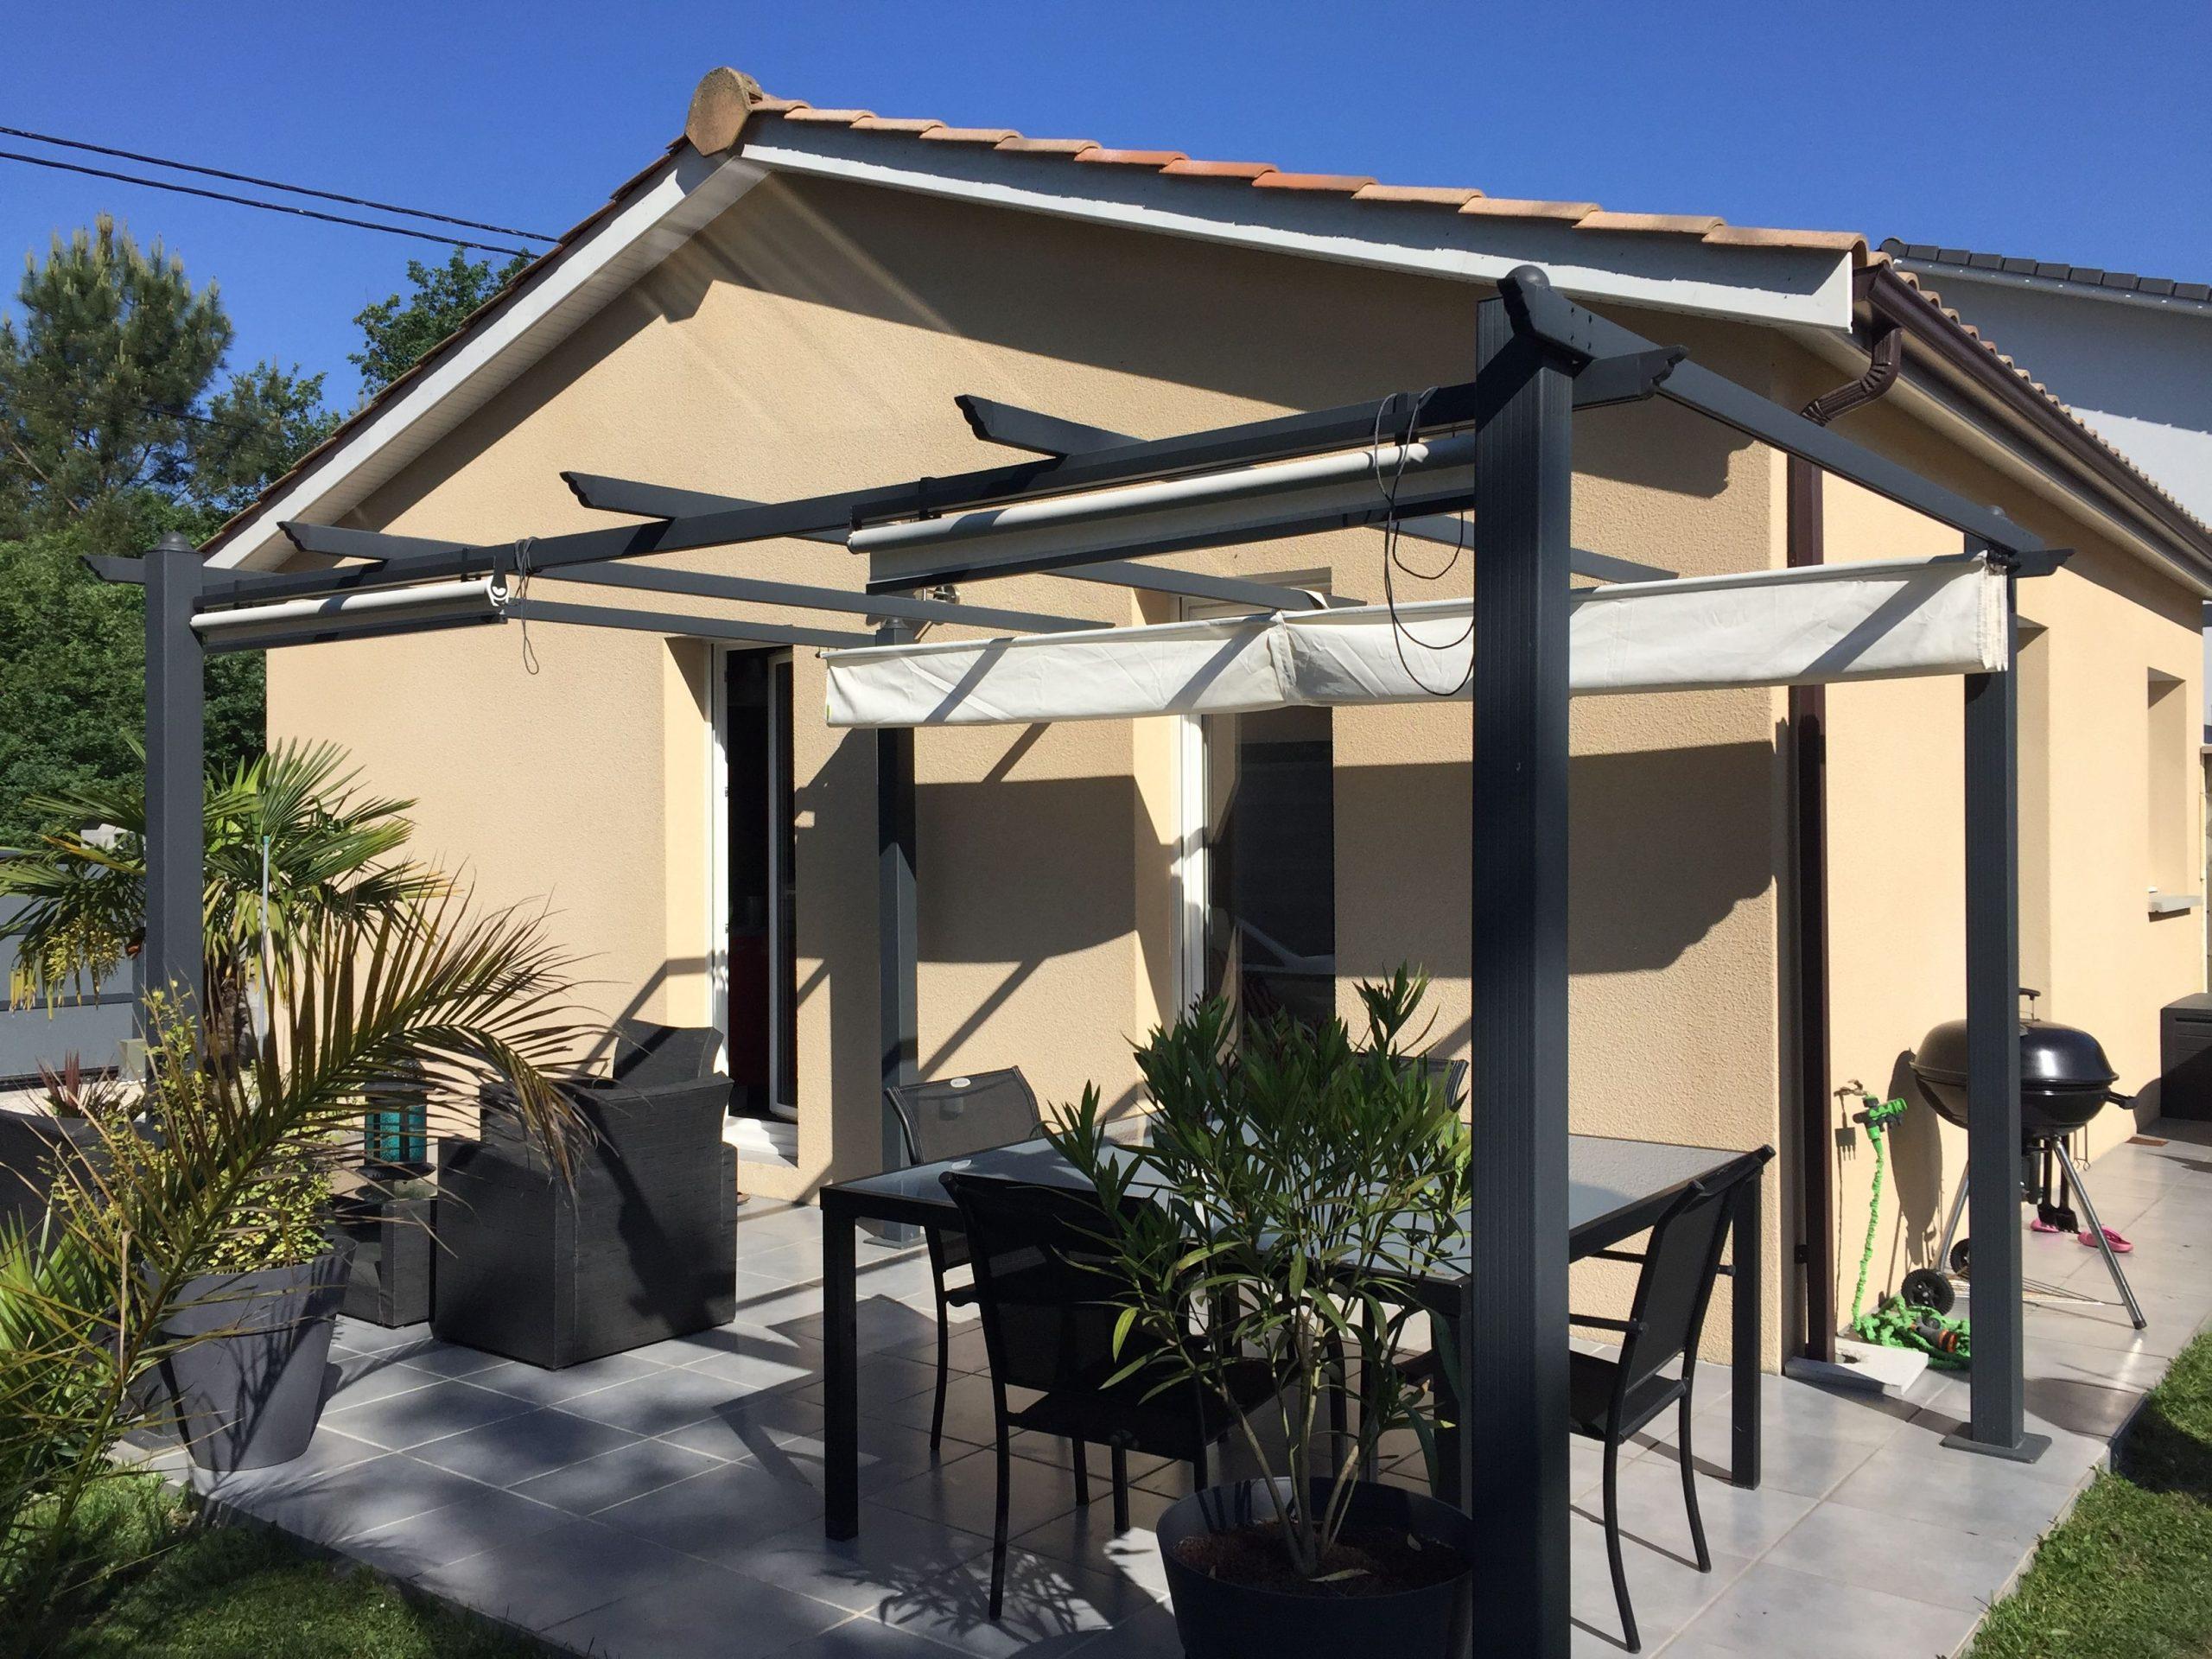 Condate Pergola Alice's Garden : Aluminium 3X3M Avec Toile ... destiné Alice Garden Tonnelle